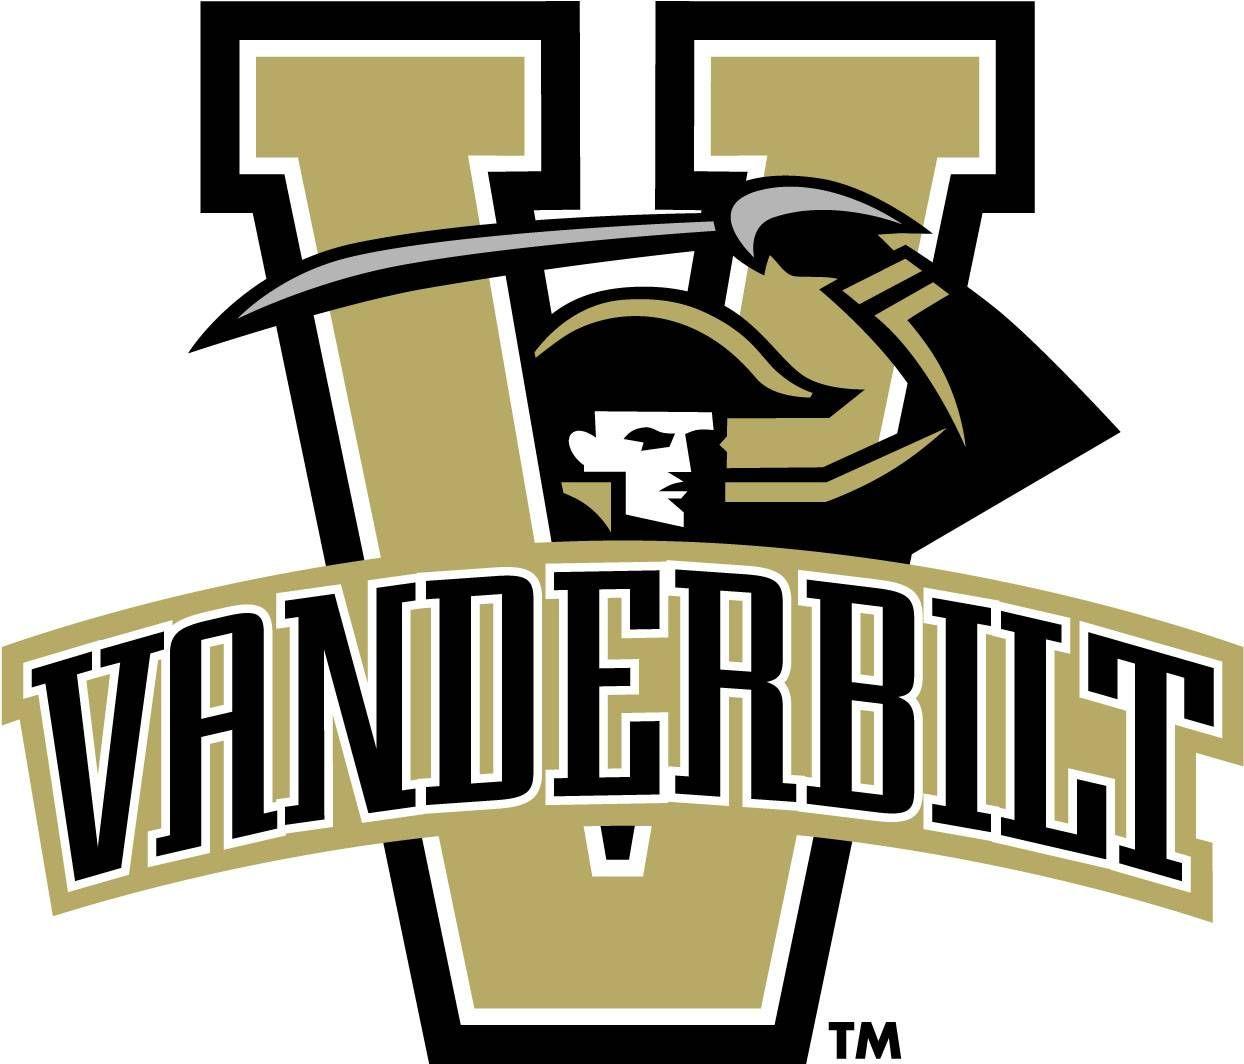 Vanderbilt commodores mascot clipart image royalty free library Vanderbilt University Commodores football - new logo ... image royalty free library